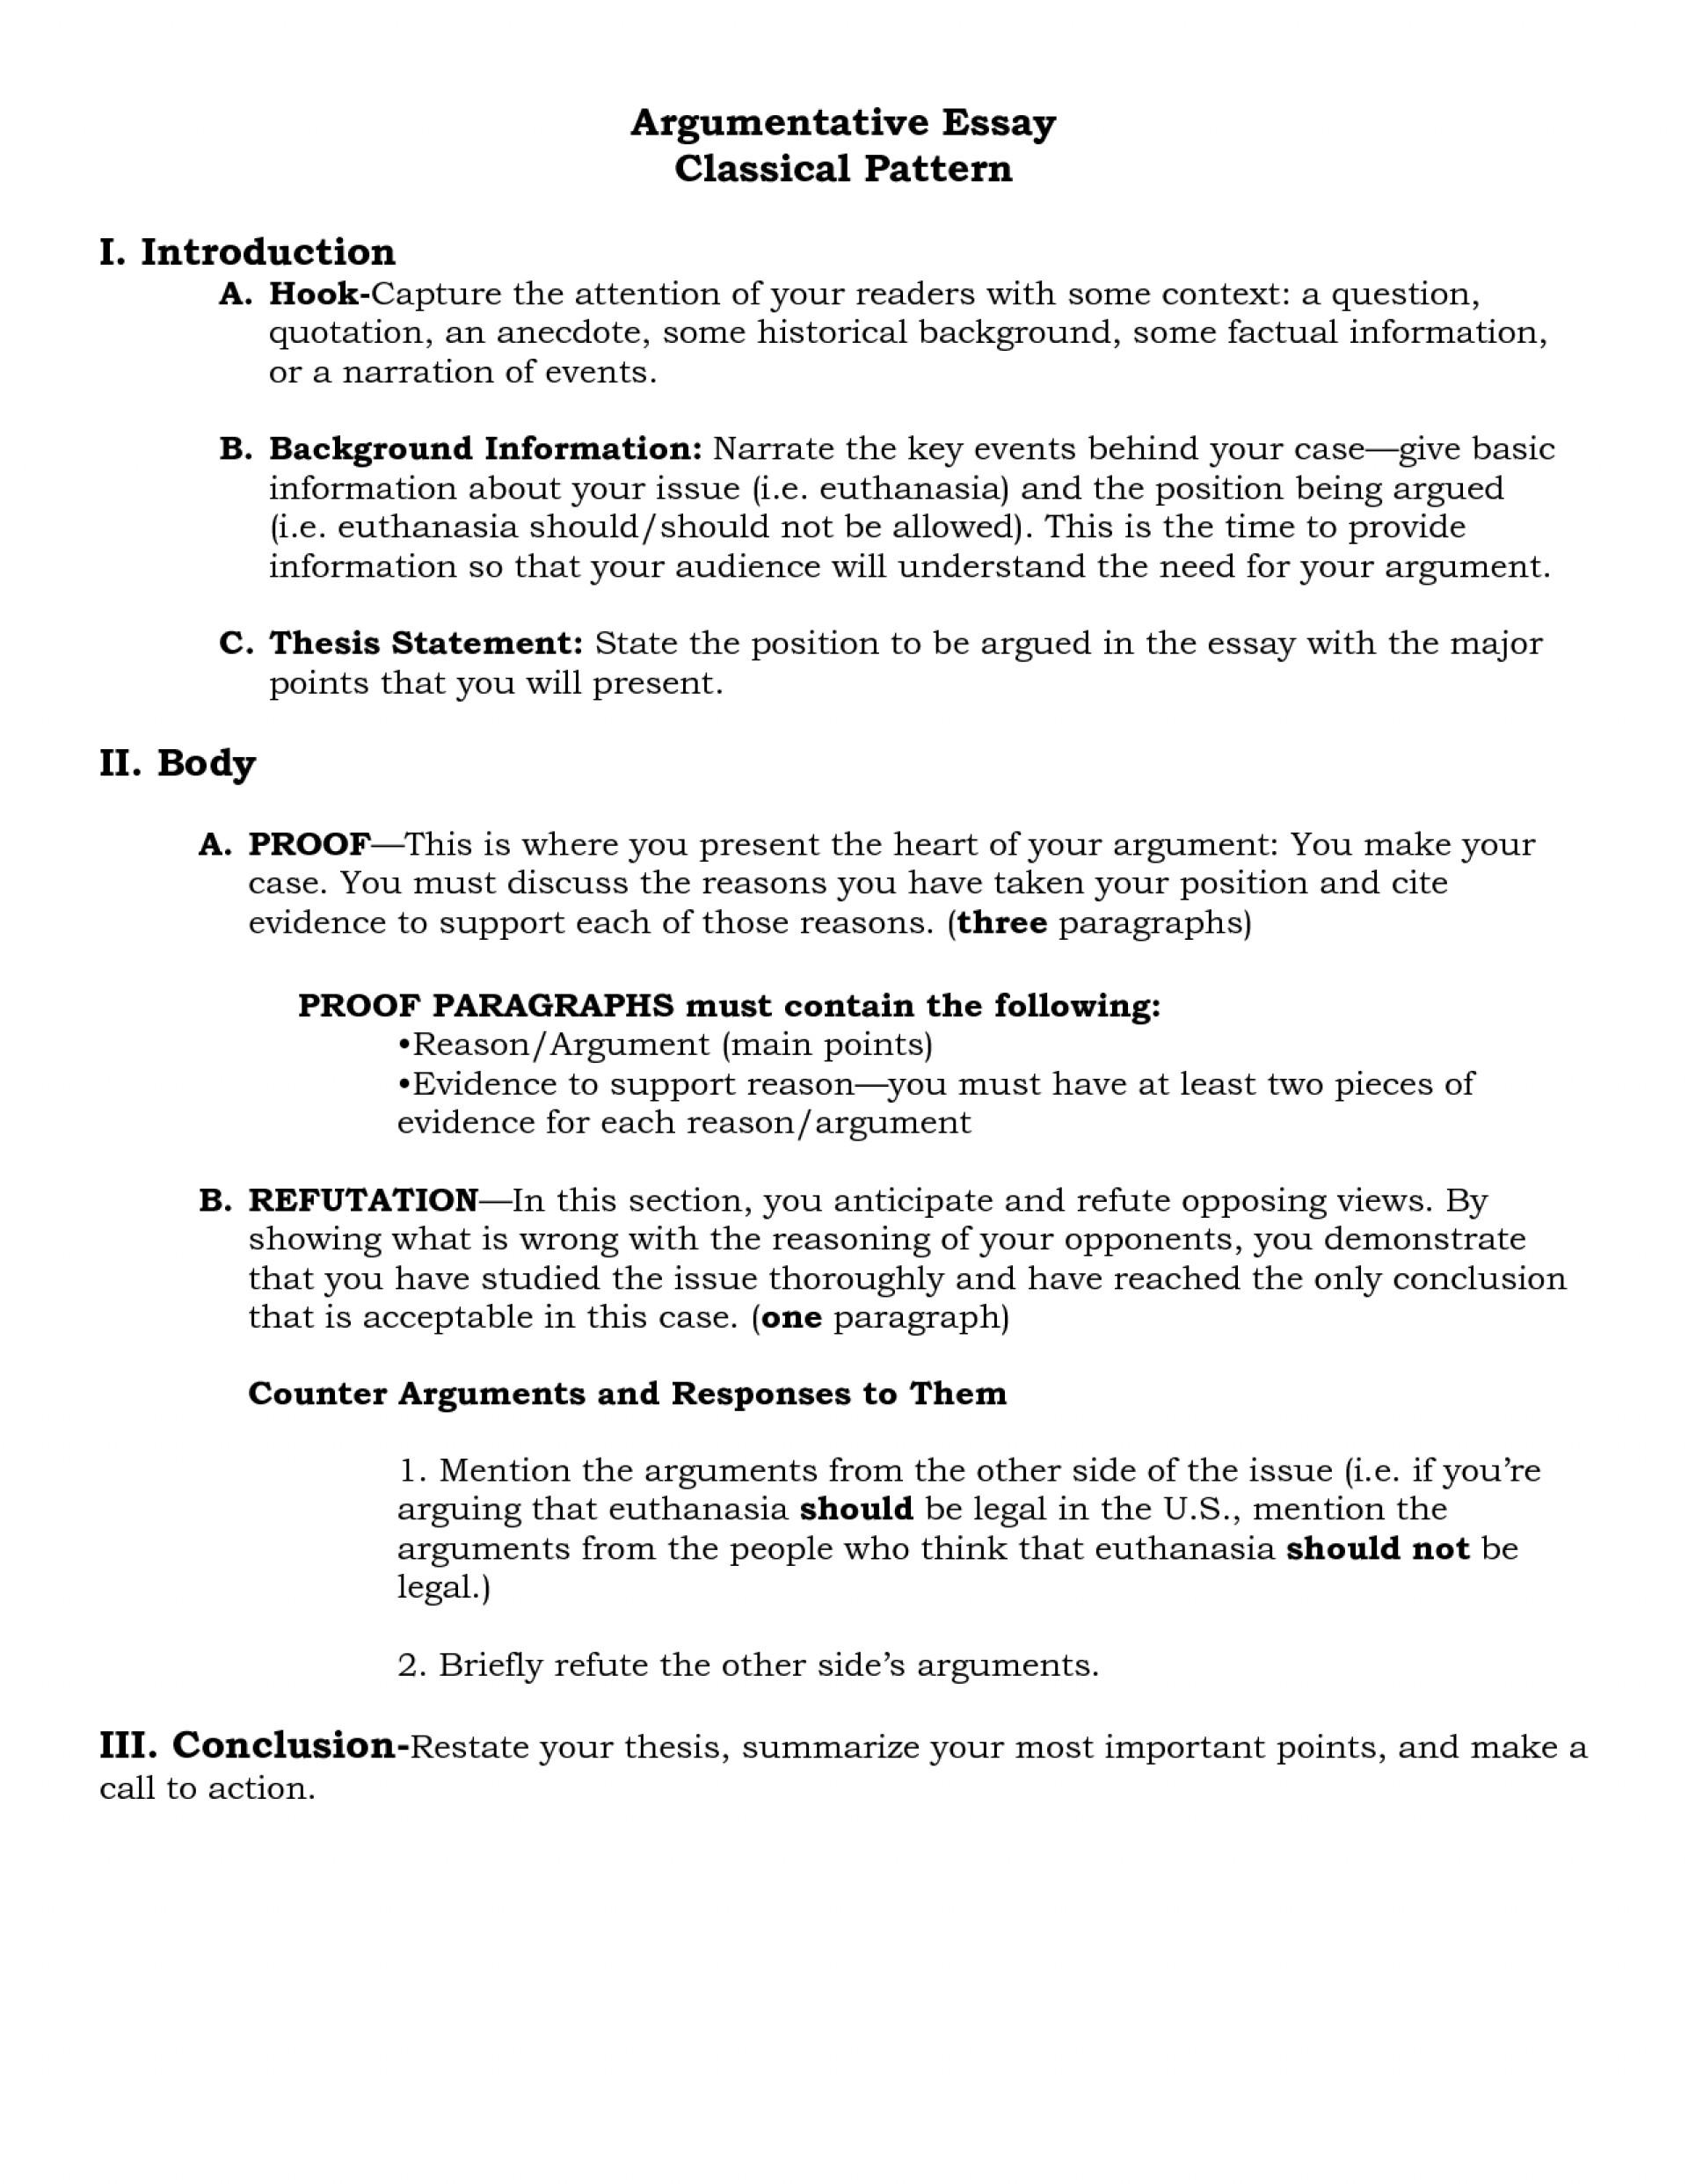 006 Essay Example Argument Outline Remarkable Sample 5 Paragraph Argumentative Template Blank 1920